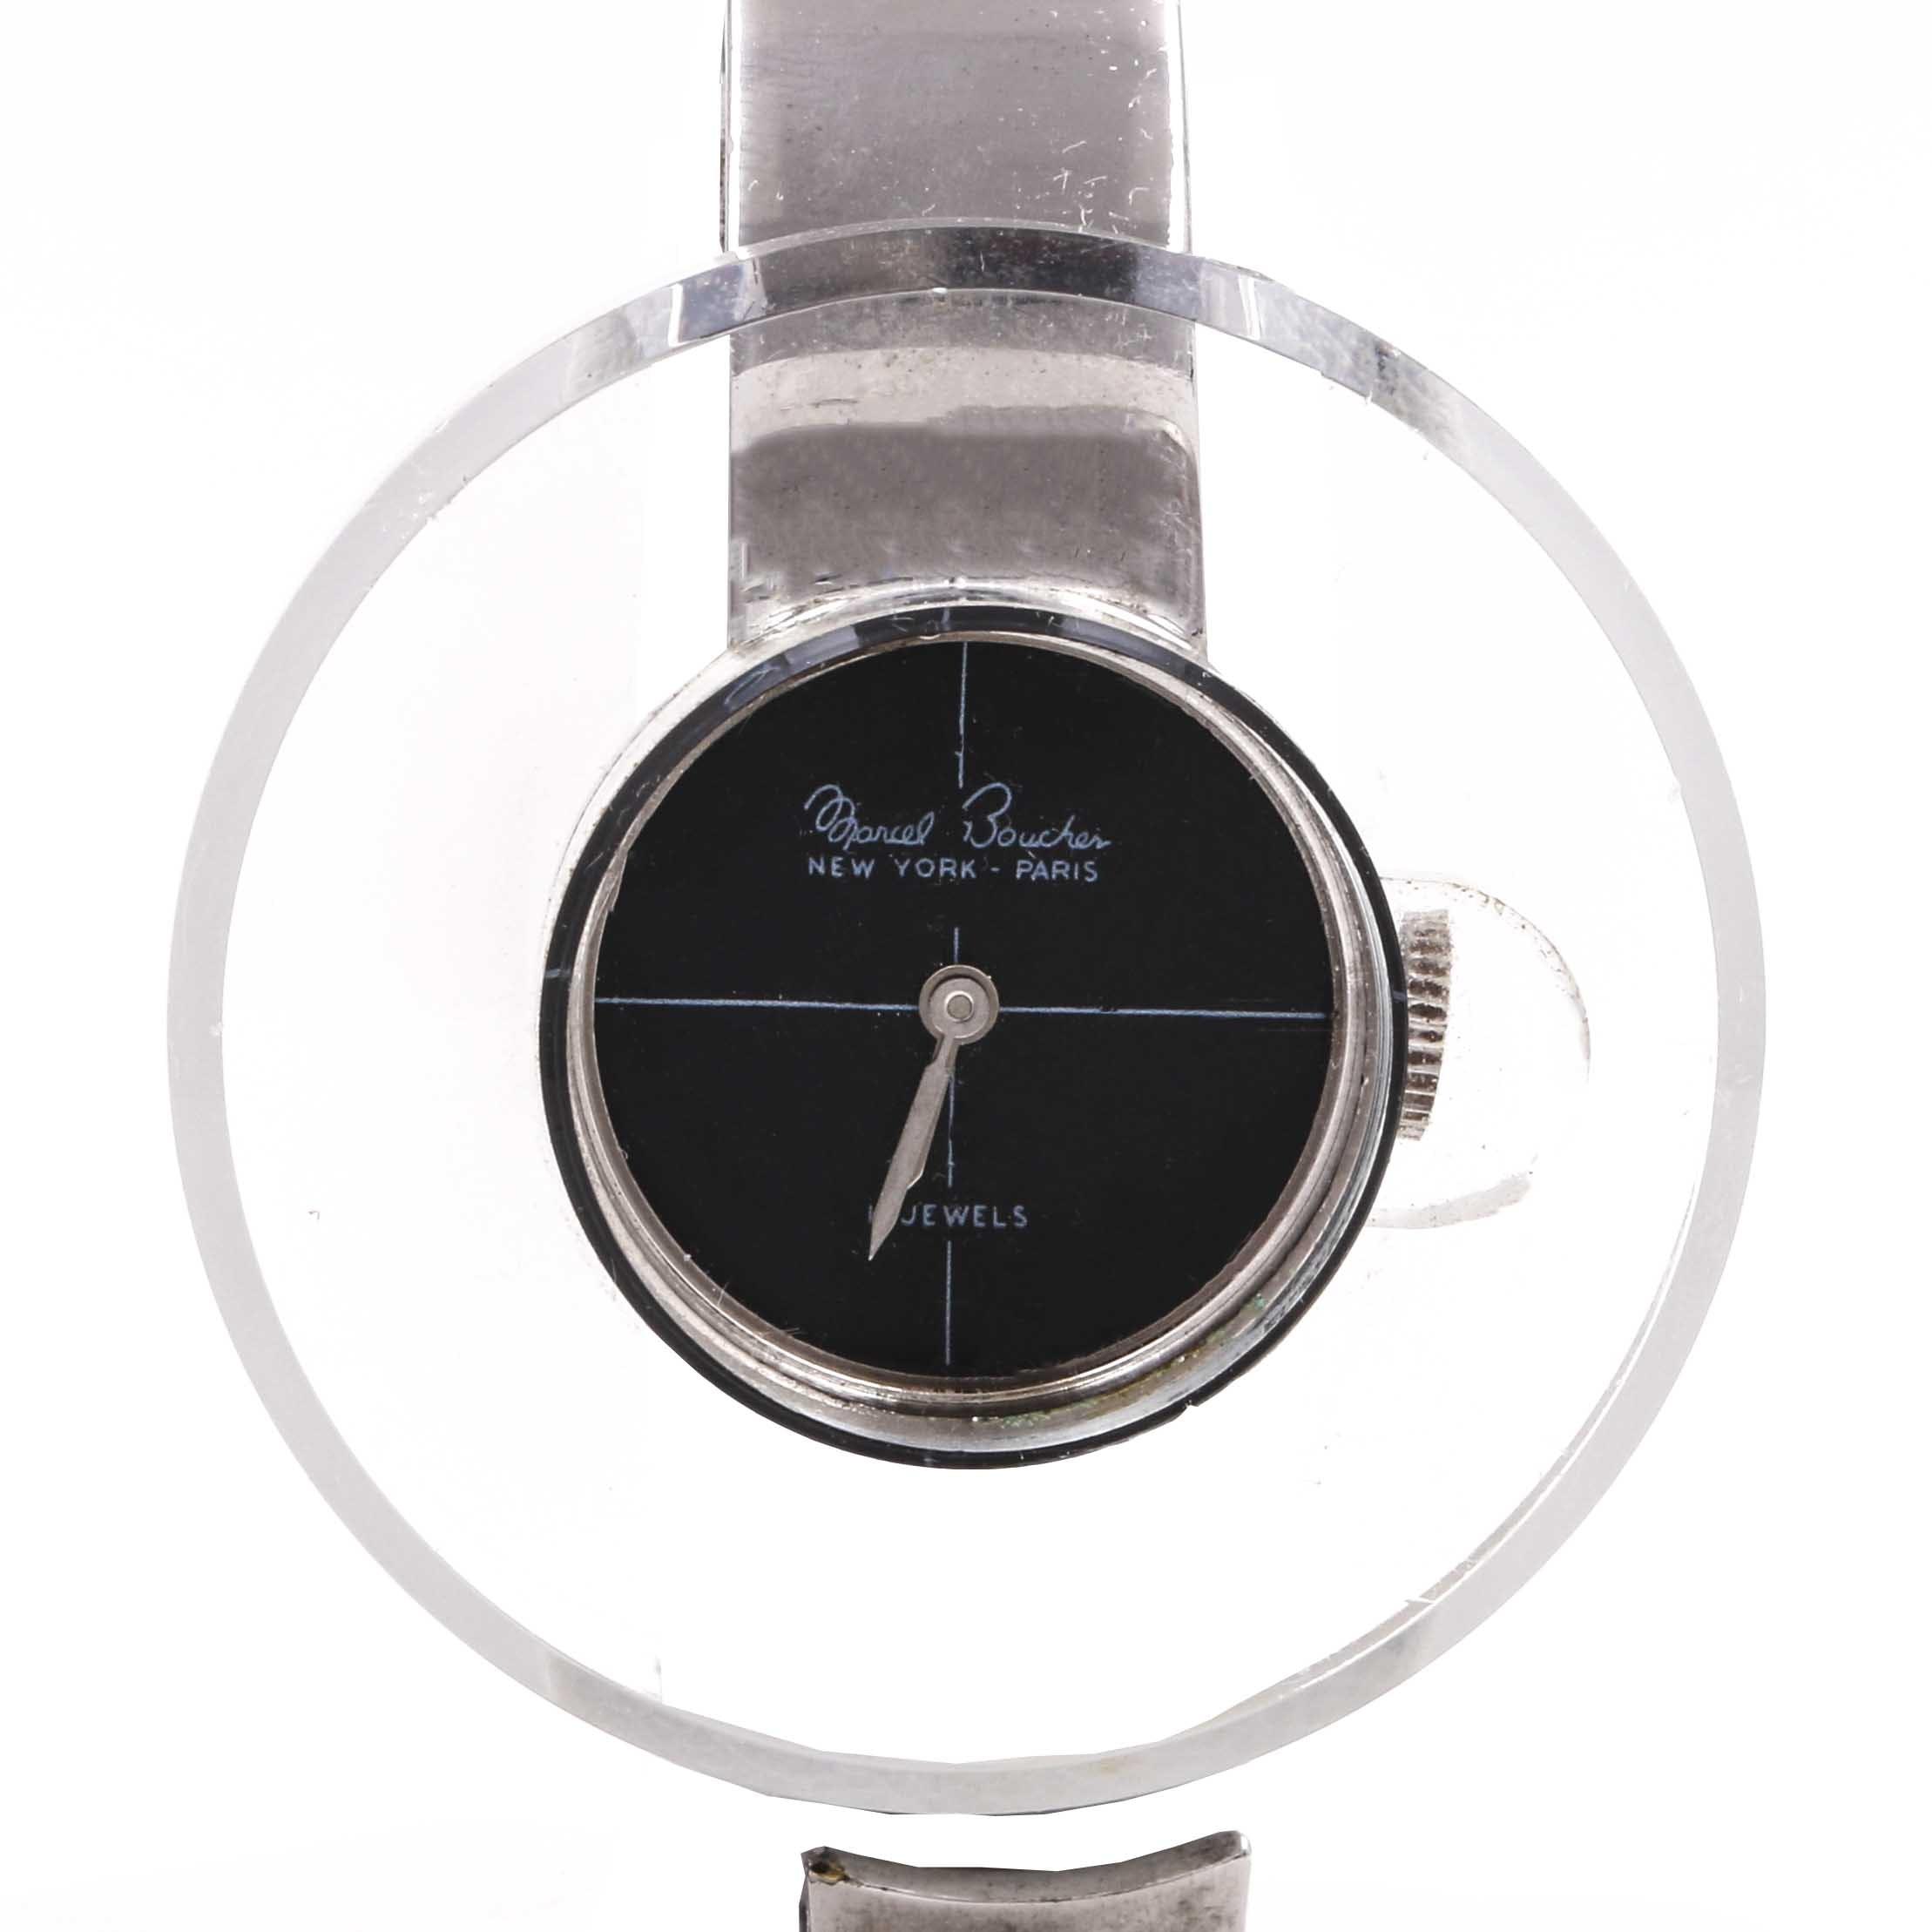 Marcel Boucher Hinged Wristwatch